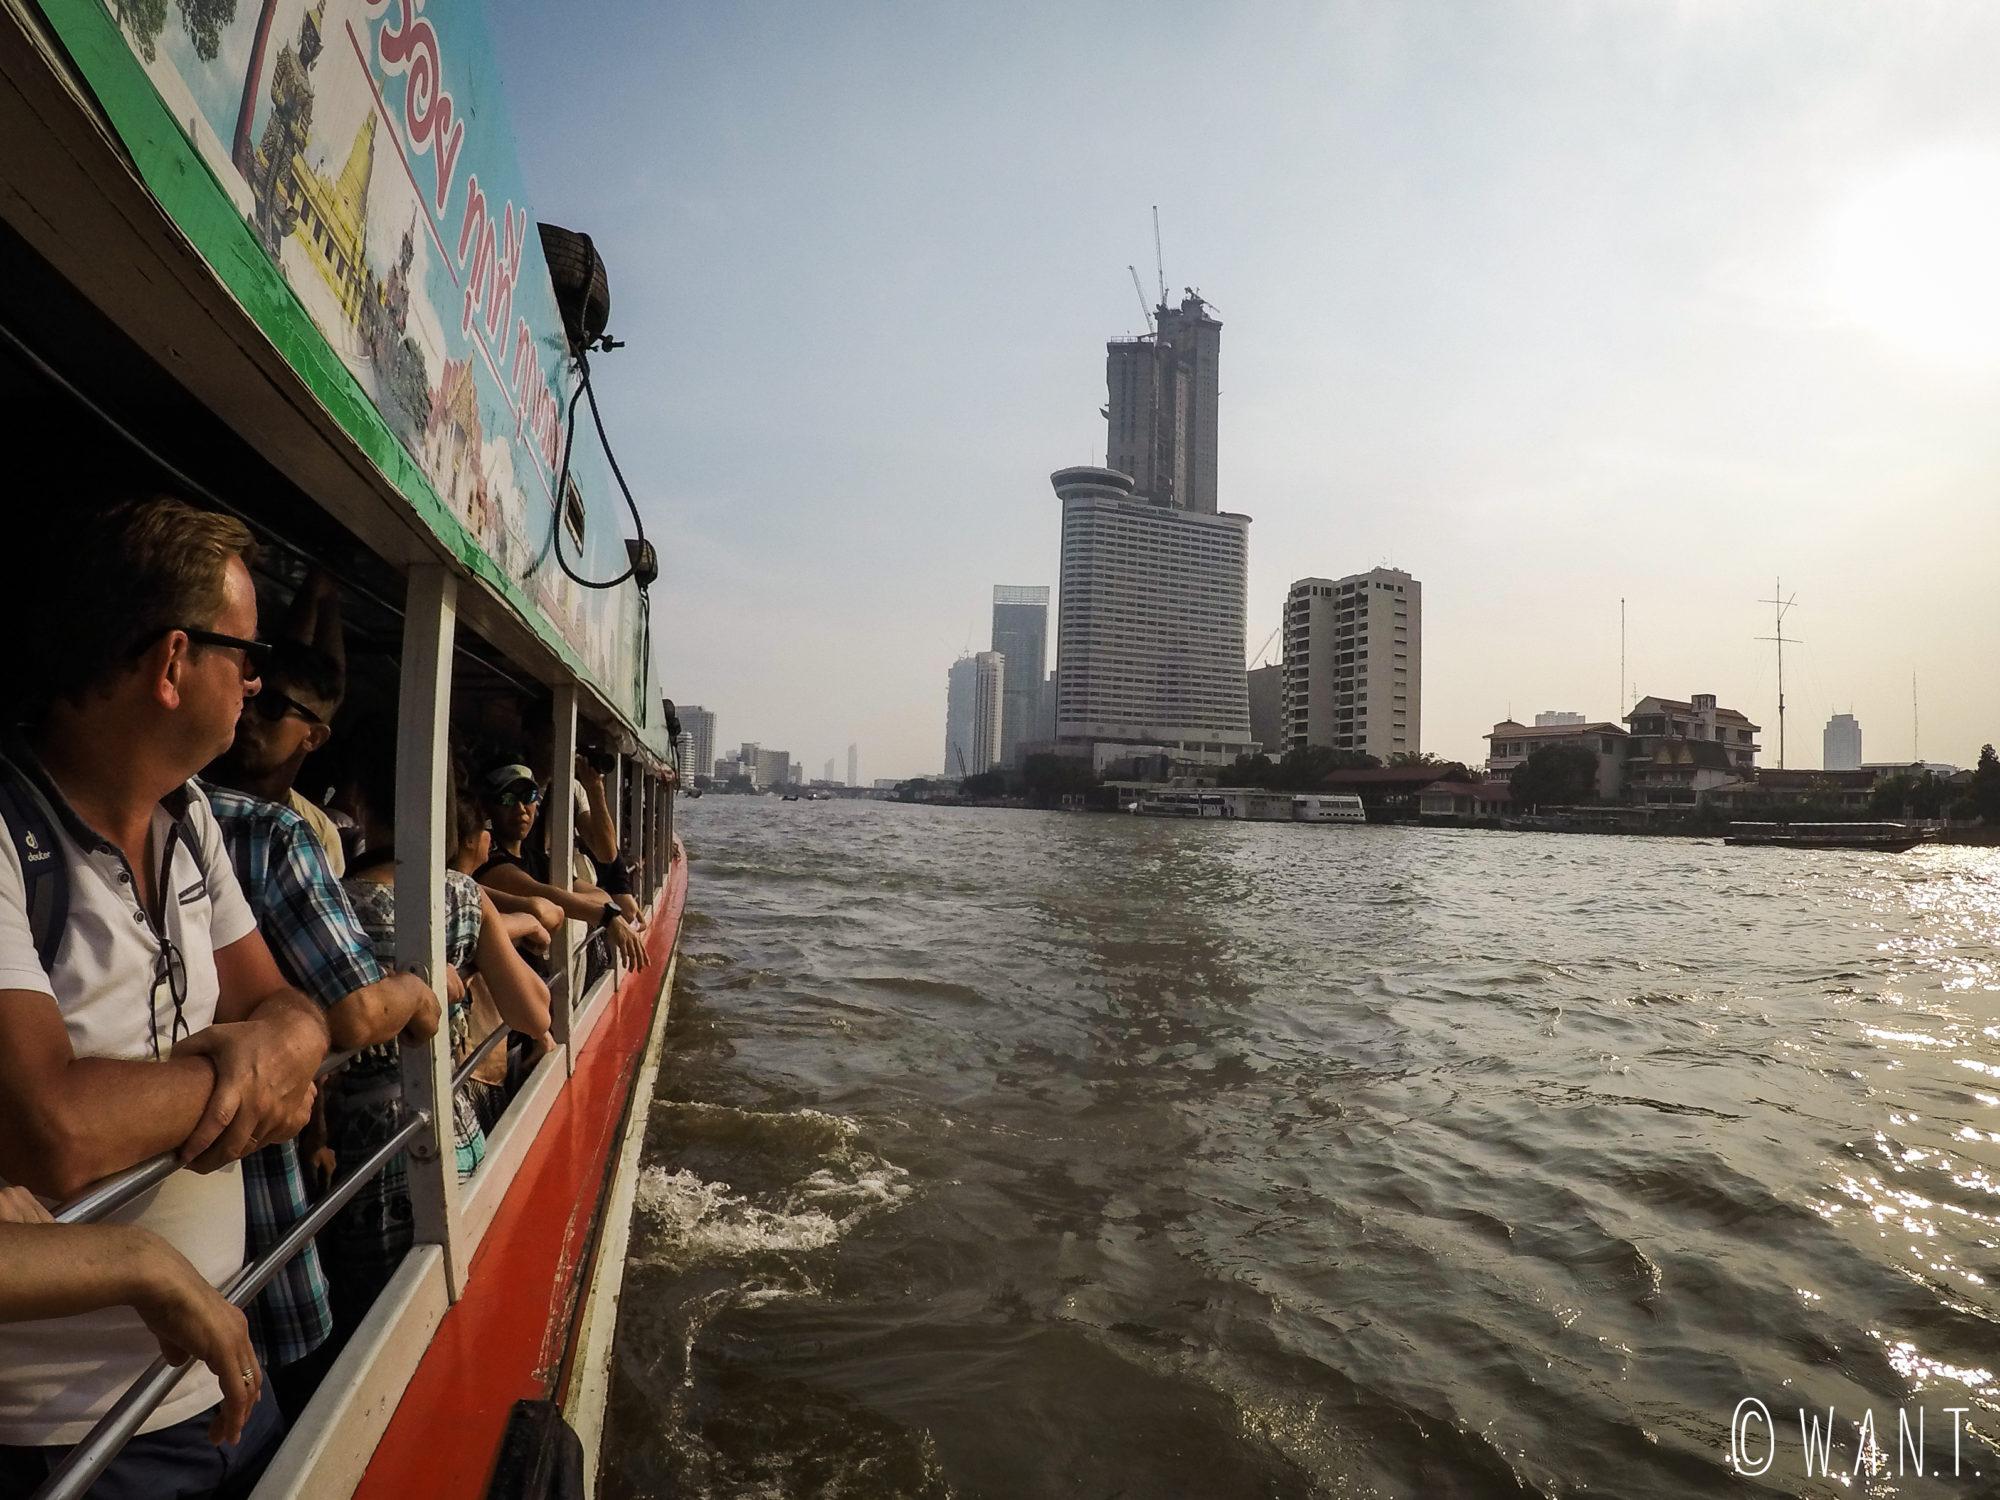 A bord du bateau express sur le Chao Phraya